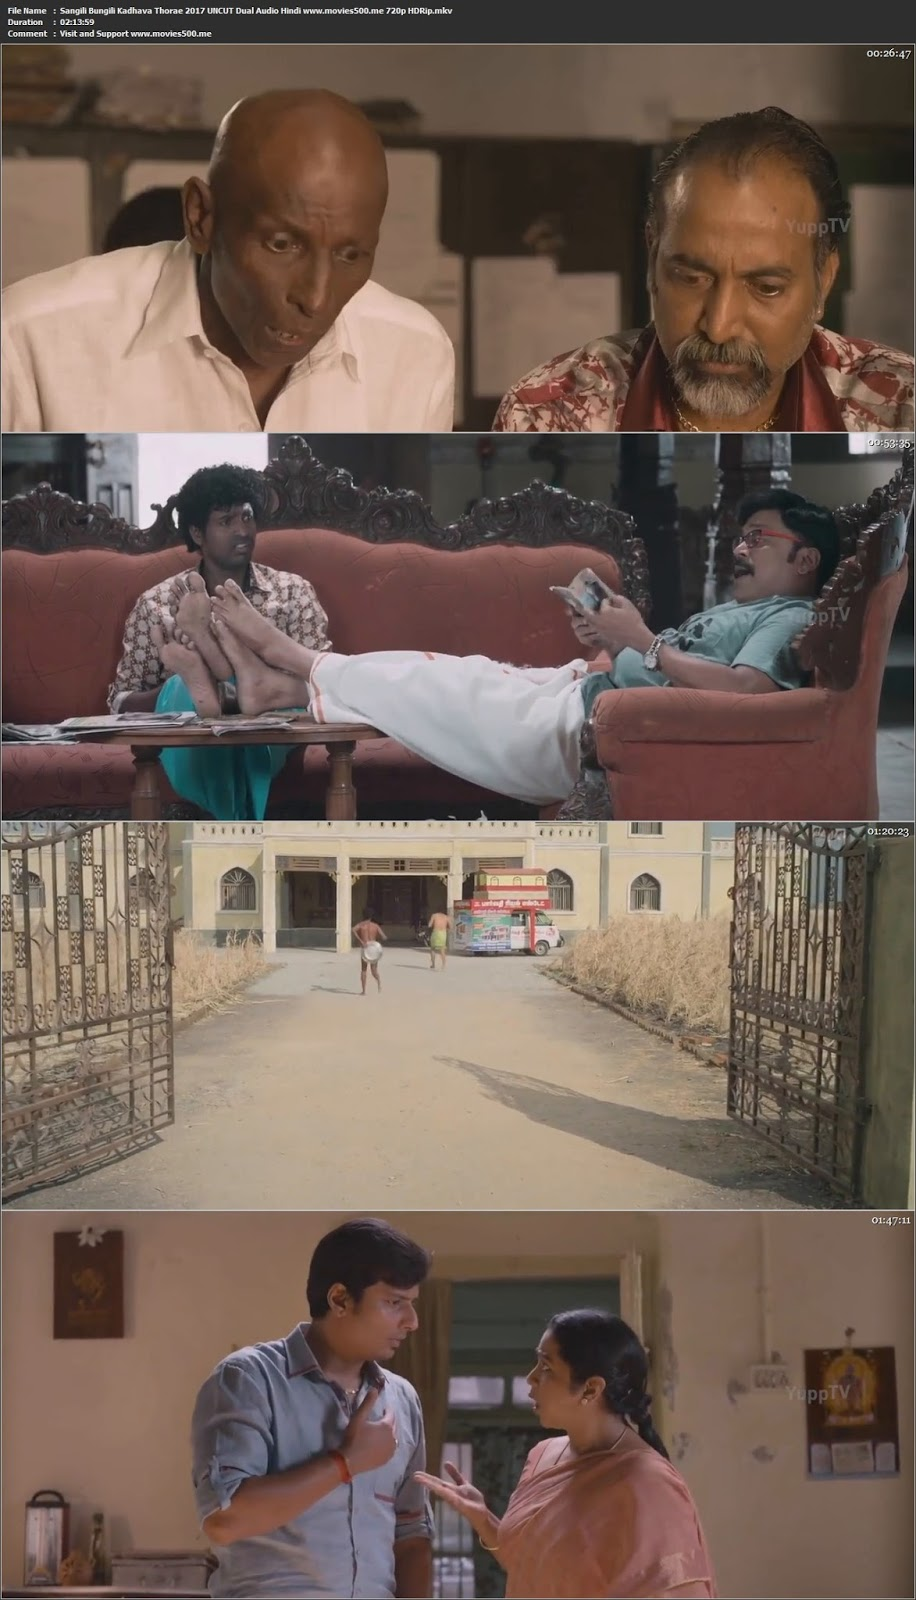 Sangili Bungili Kadhava Thorae 2017 UNCUT Dual Audio Hindi HDRip 720p at freedomcopy.com